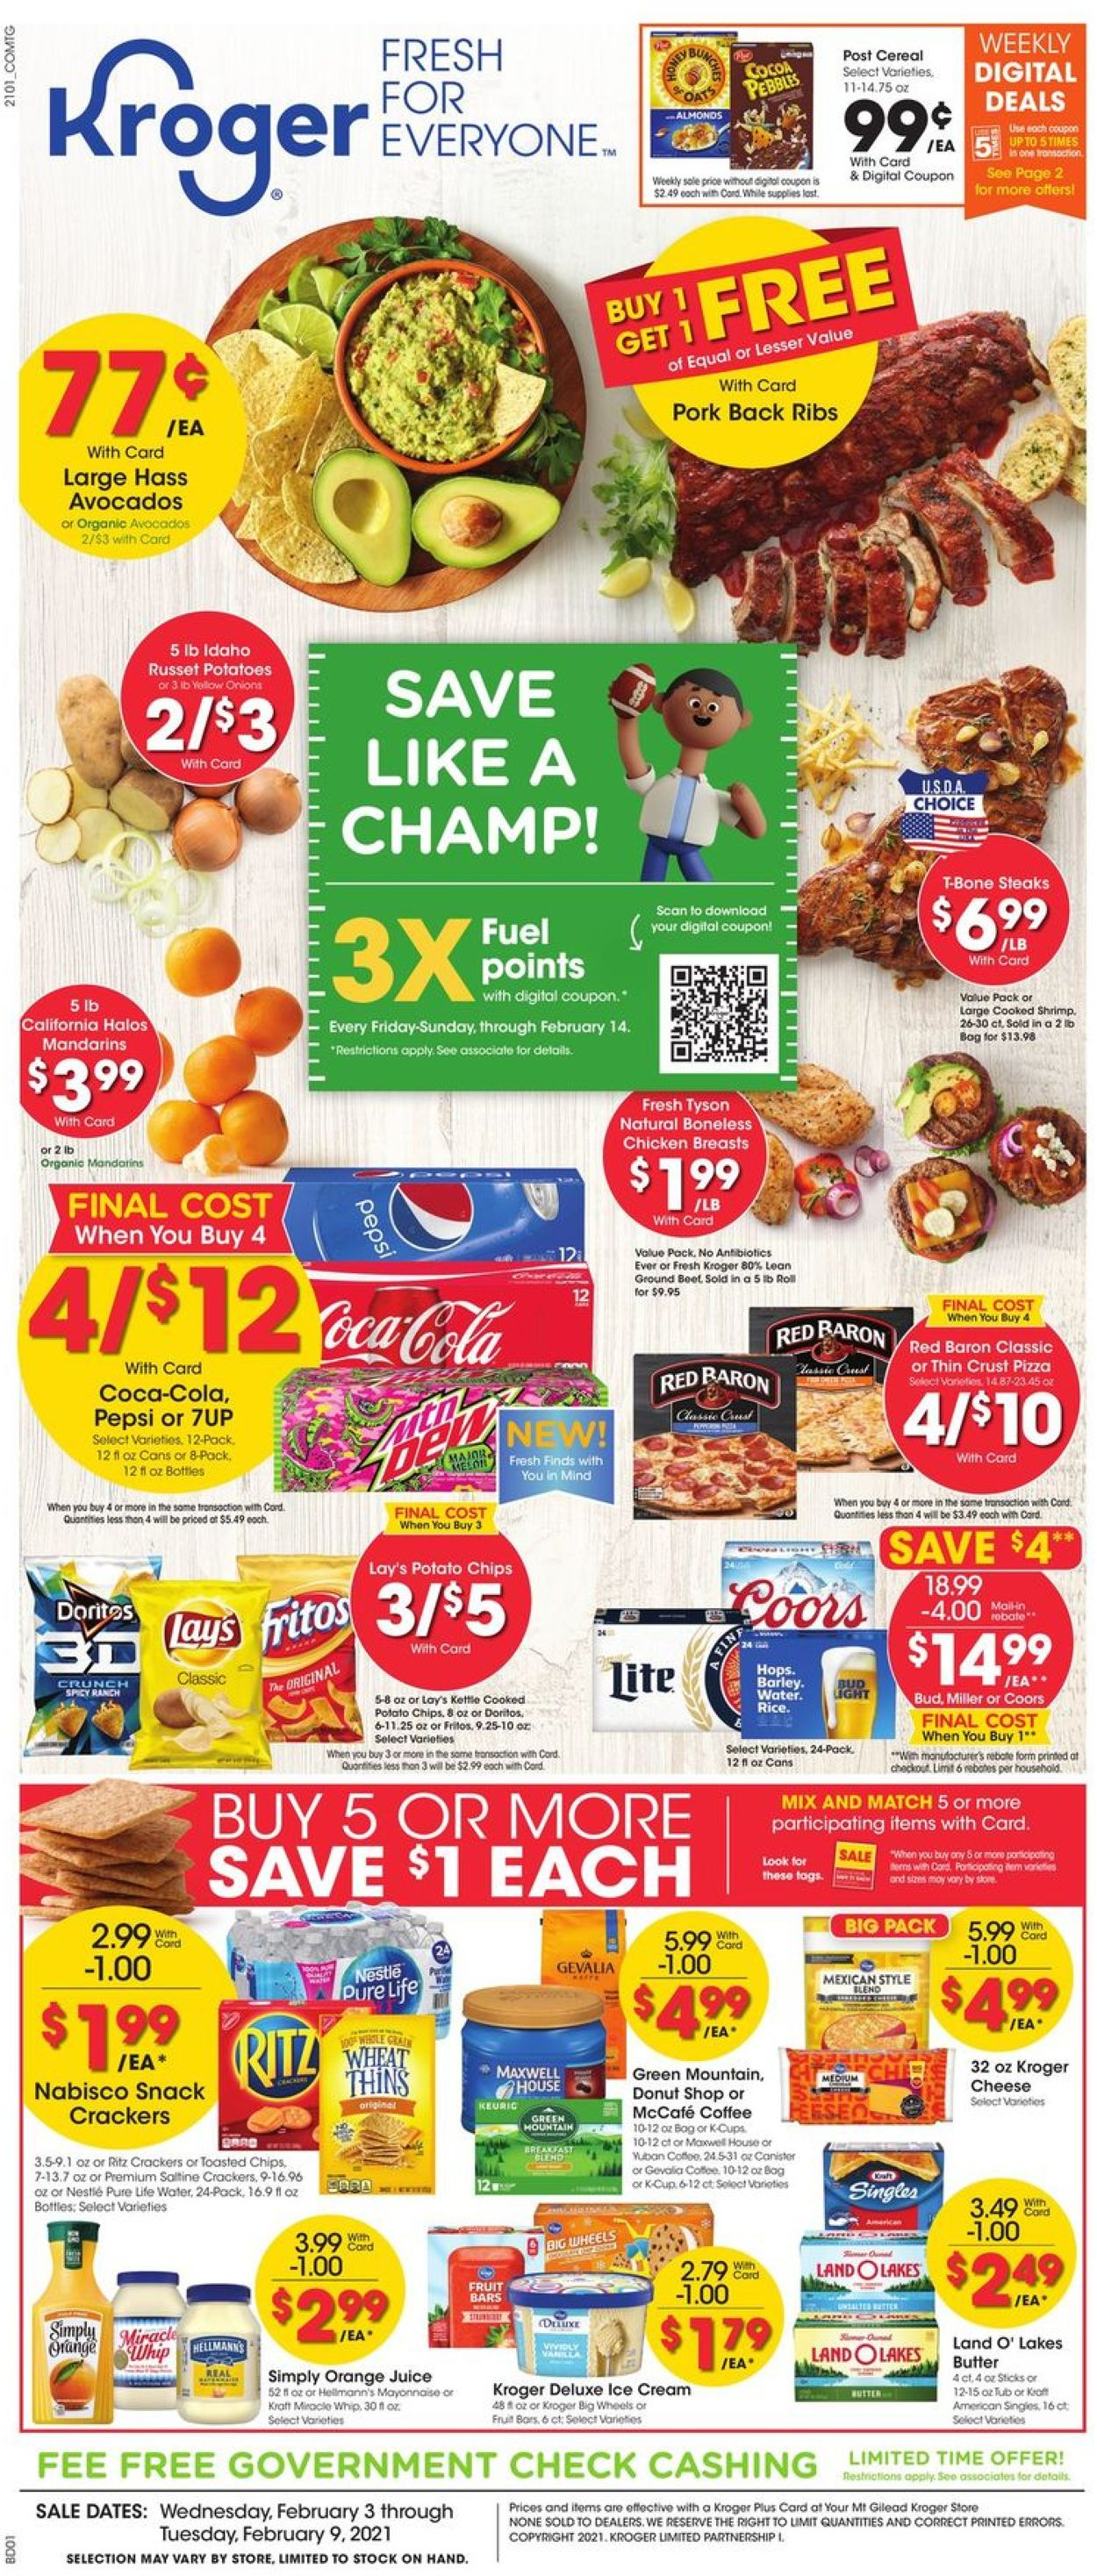 Kroger Weekly Ad Circular - valid 02/03-02/09/2021